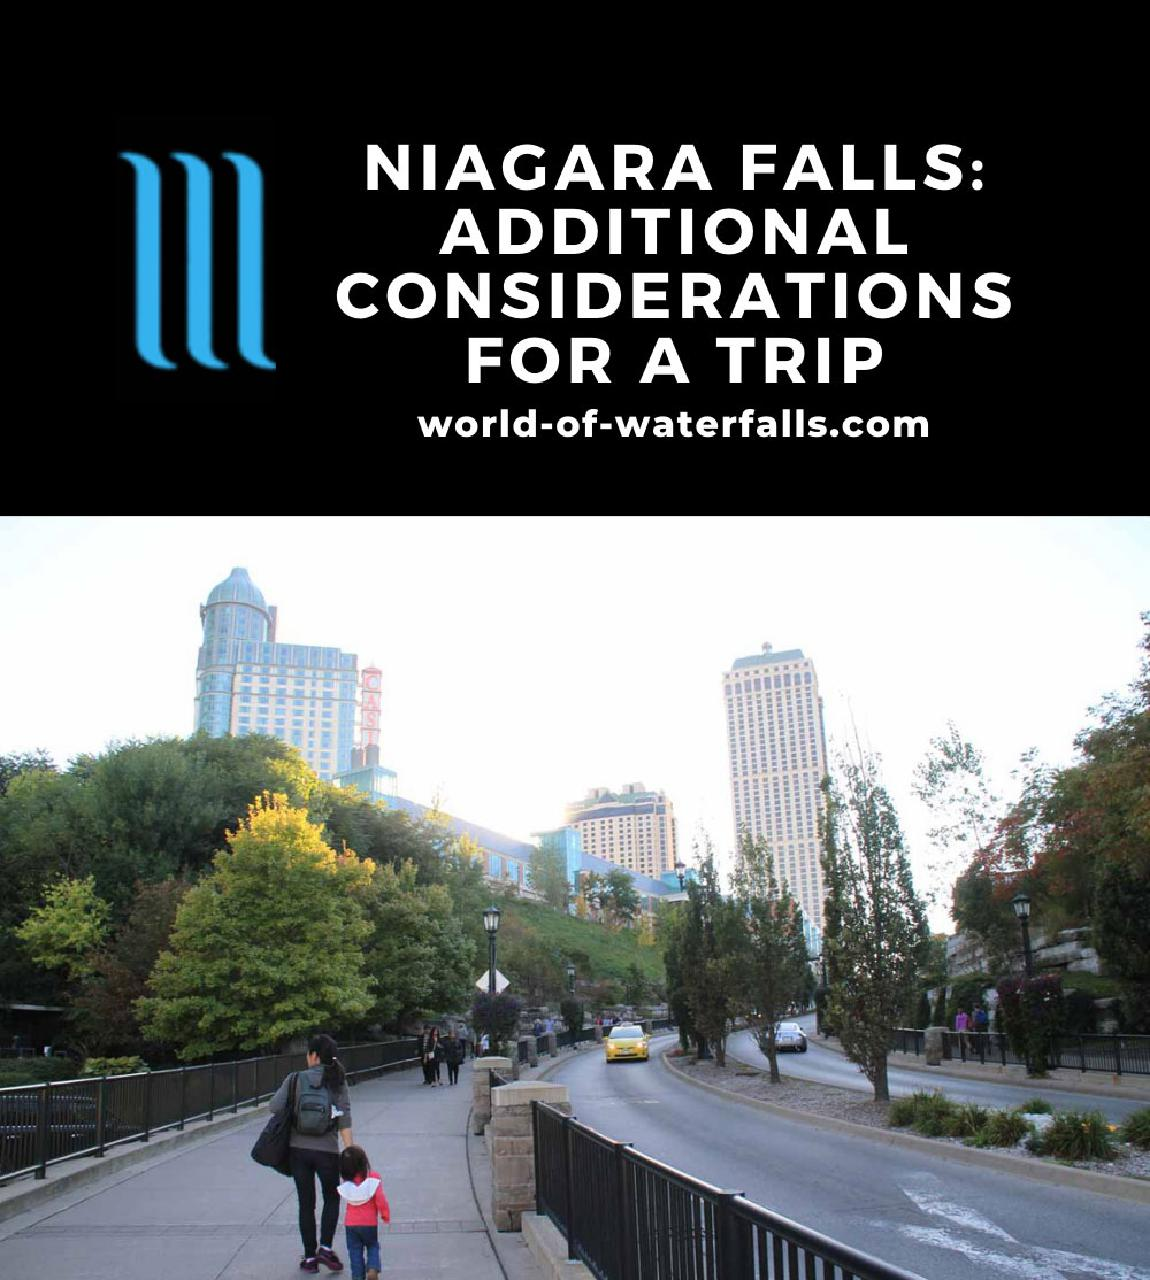 Niagara Falls: Additional Considerations for a Trip